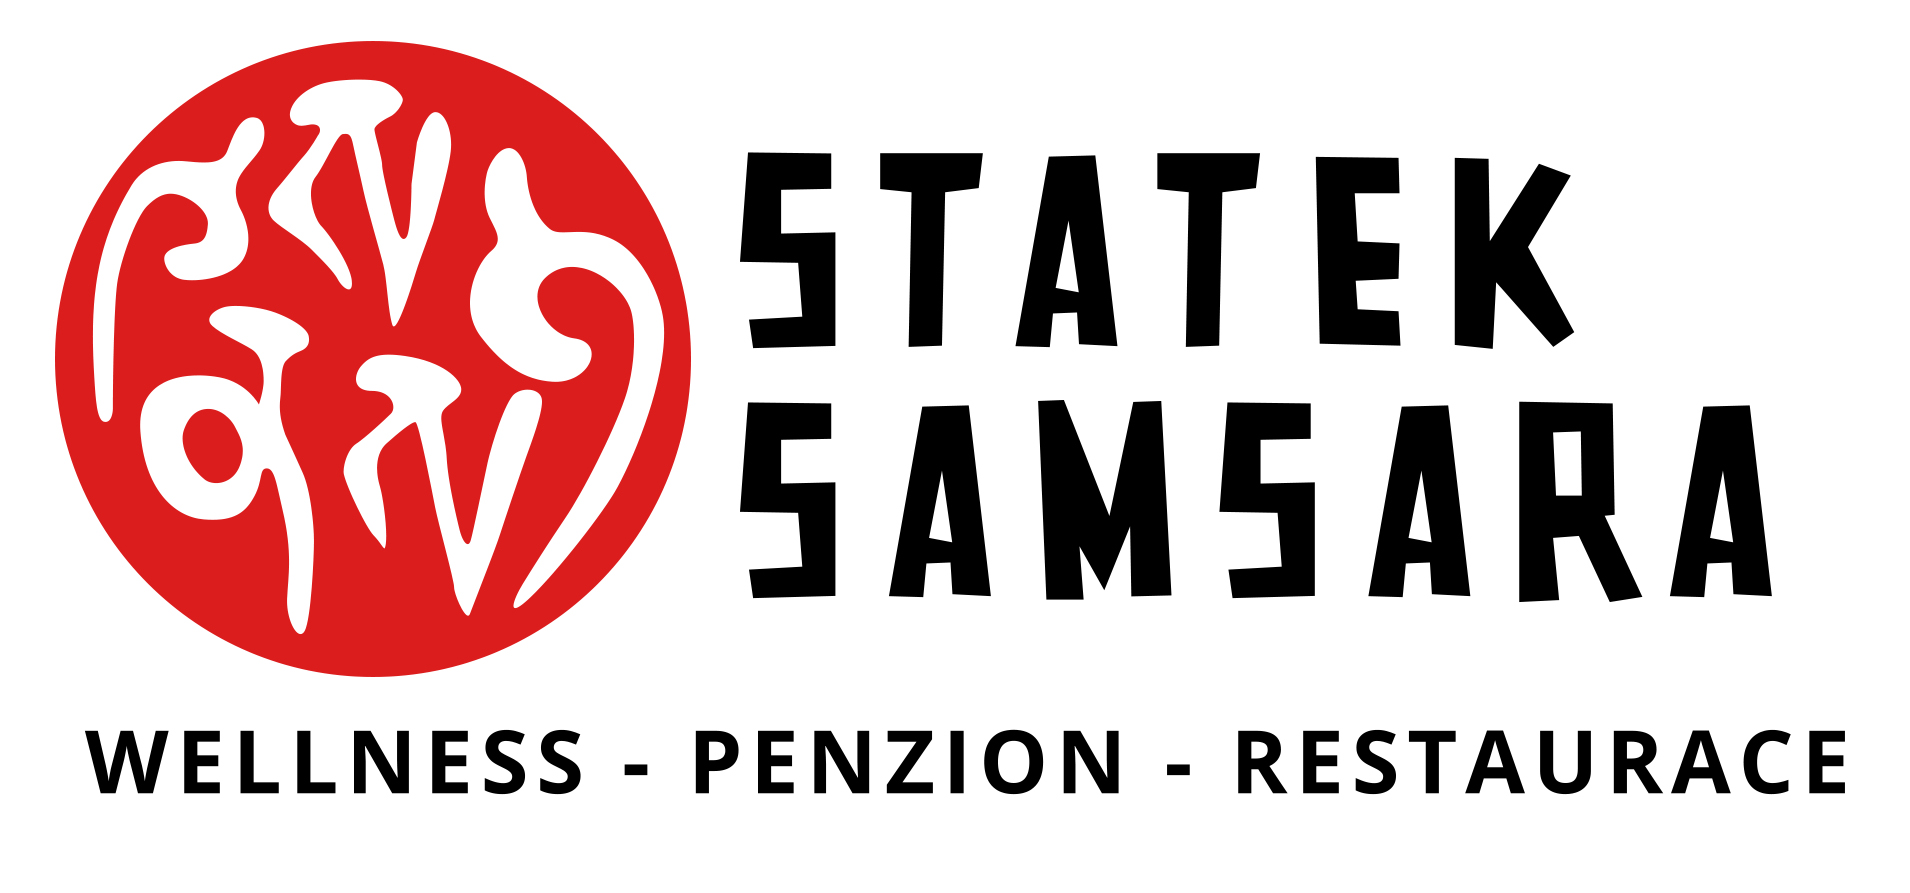 Statek Samsara